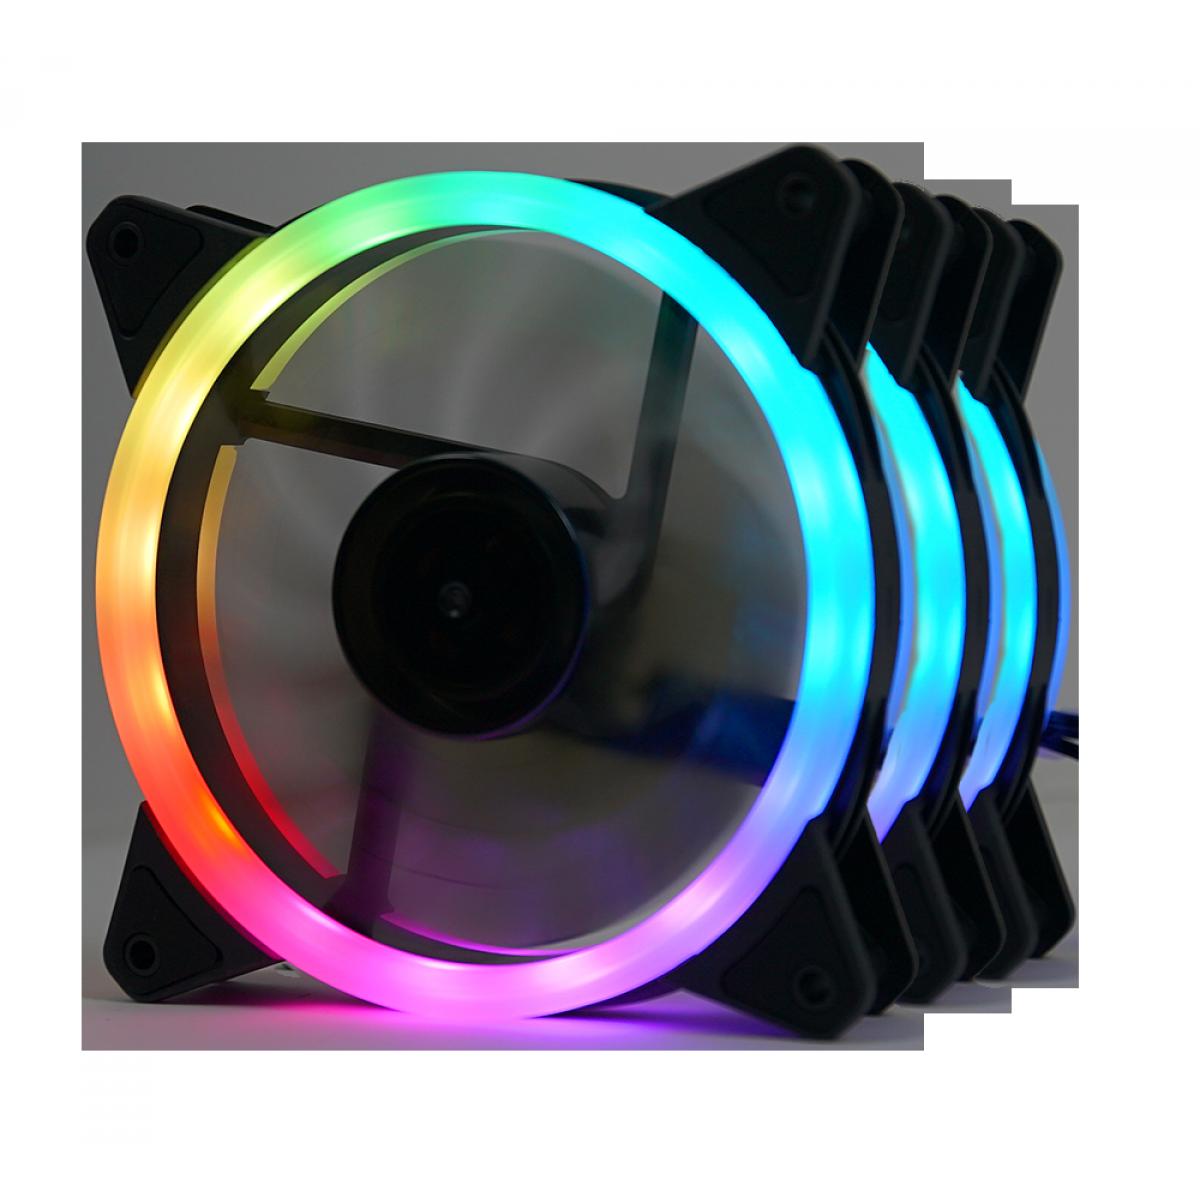 Kit Fan com 3 Unidades Redragon GC-F011, RGB, 120mm, Com Controladora, GC-F011